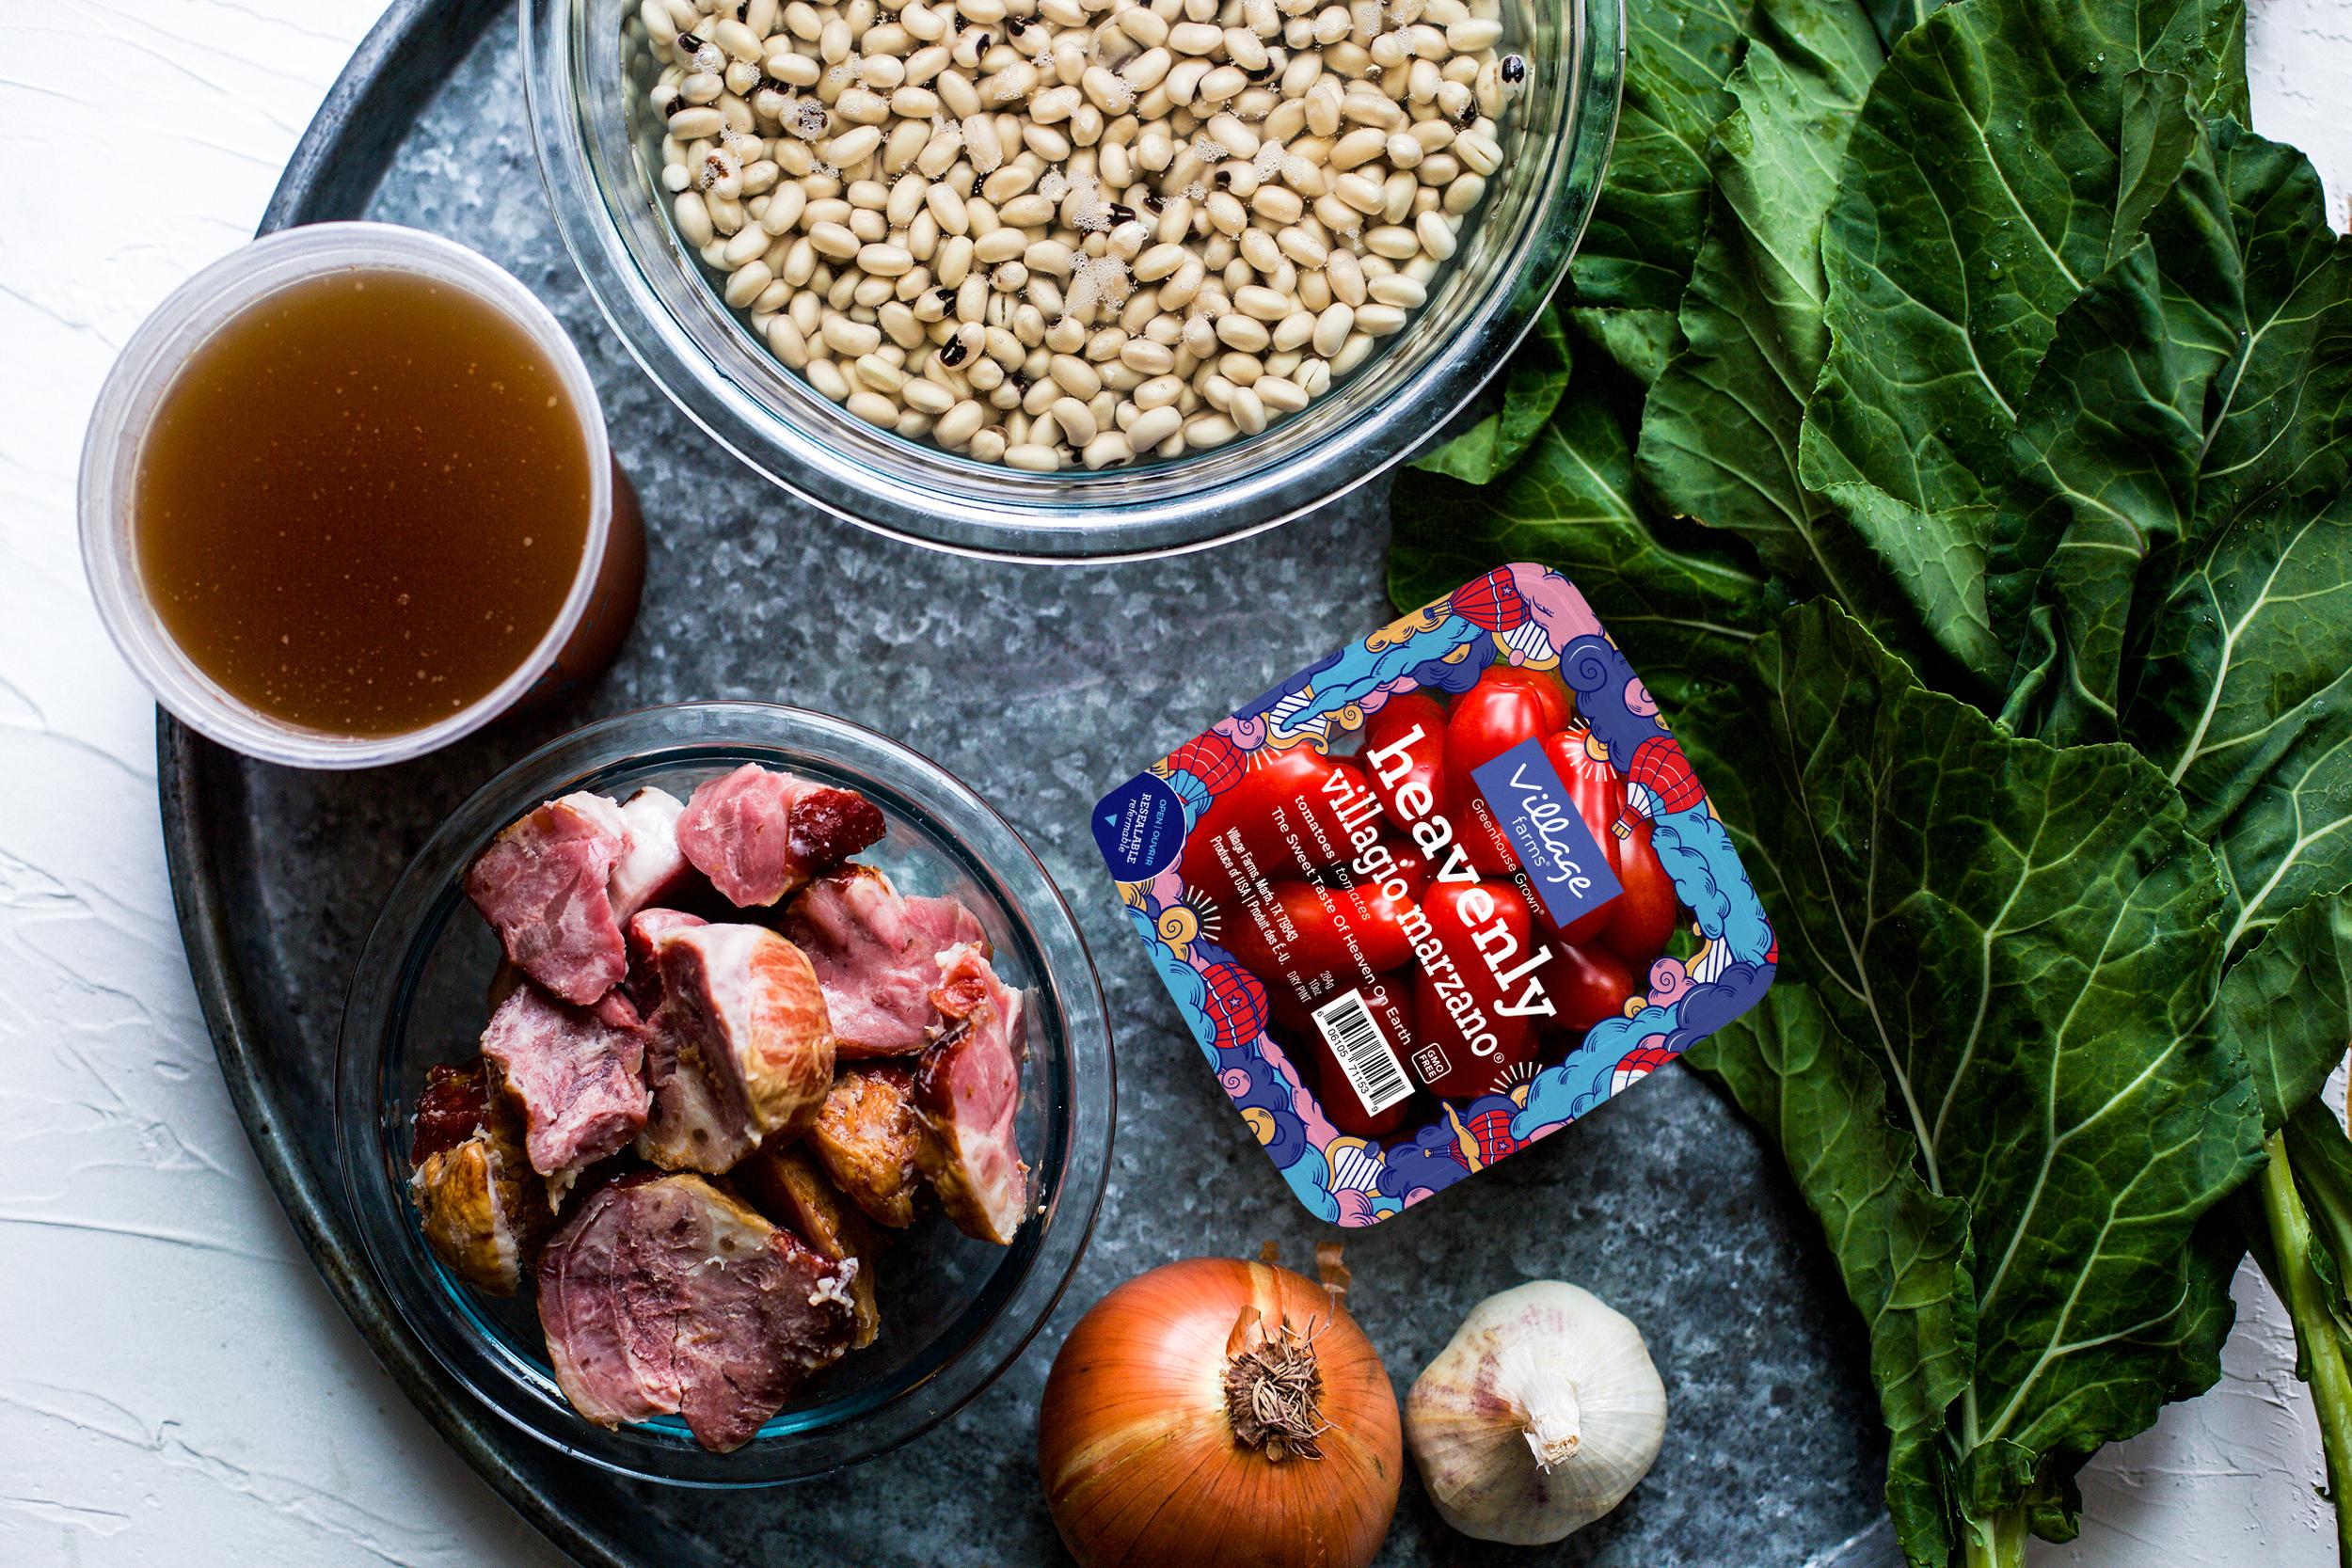 Black Eyed Pea Stew: My Diary of Us